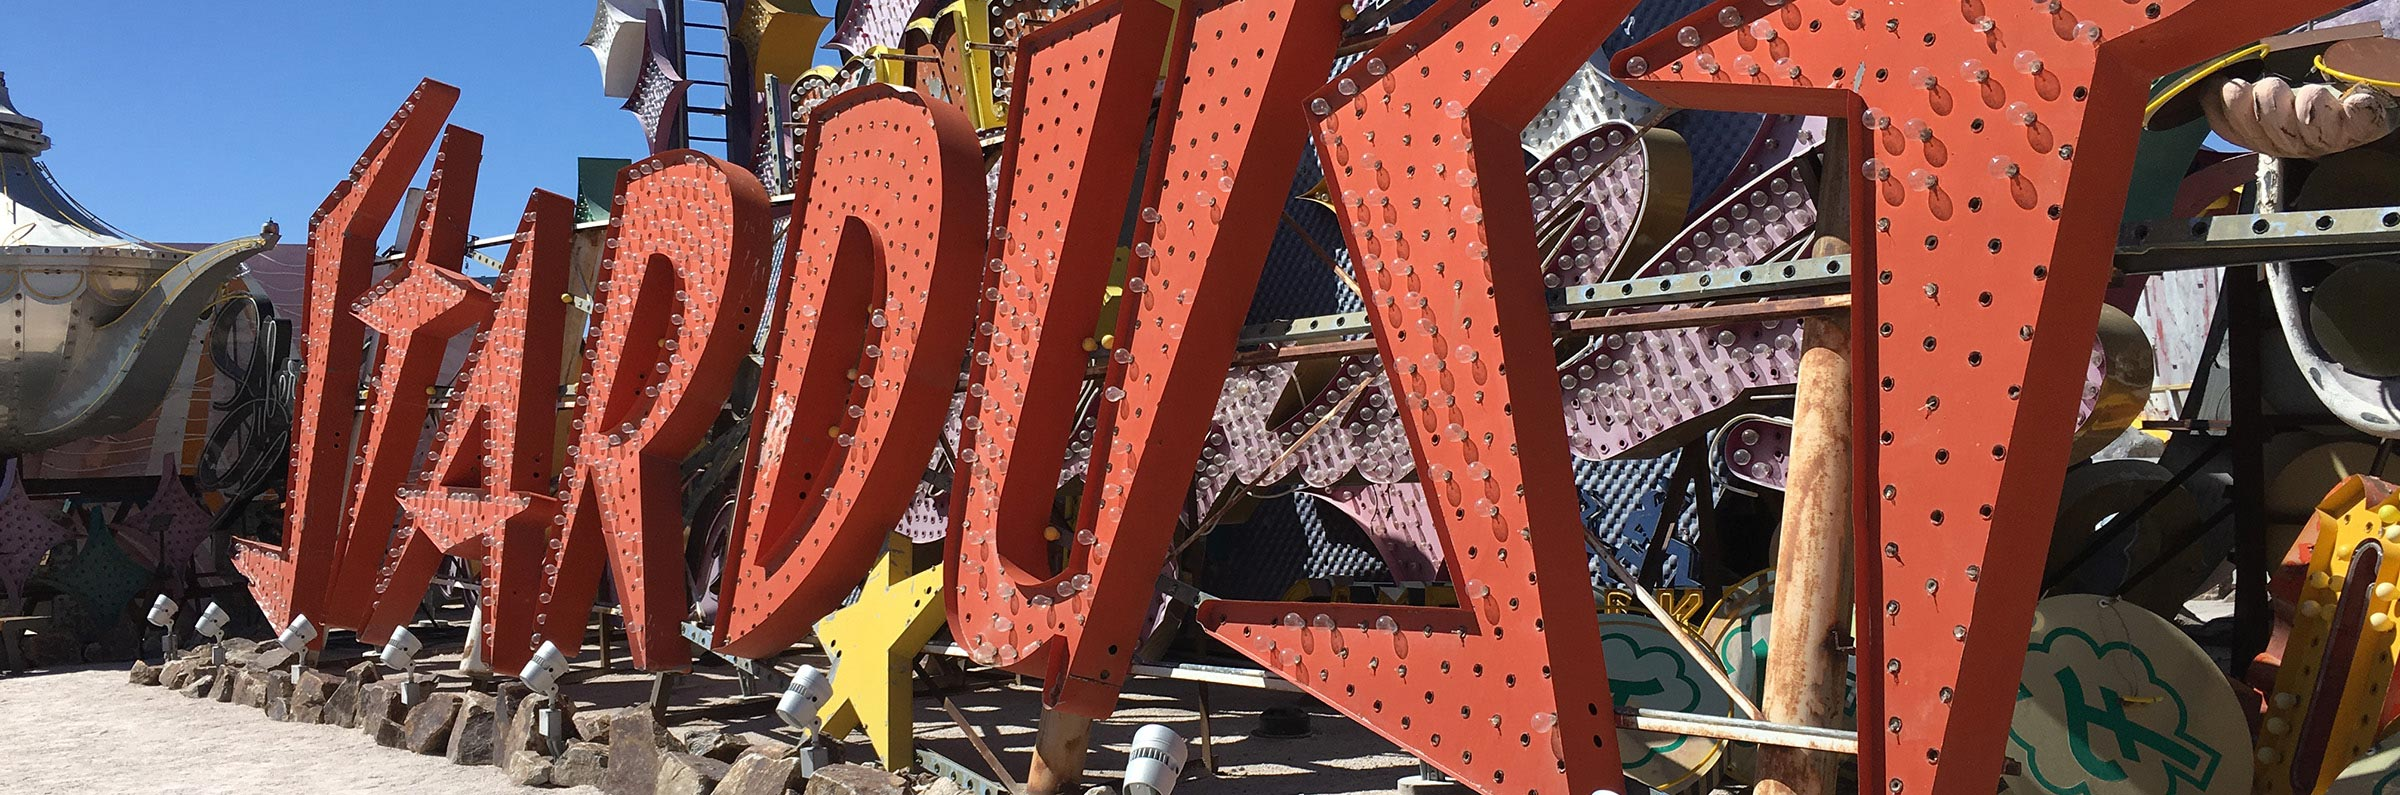 Solo a Las Vegas in Las Vegas